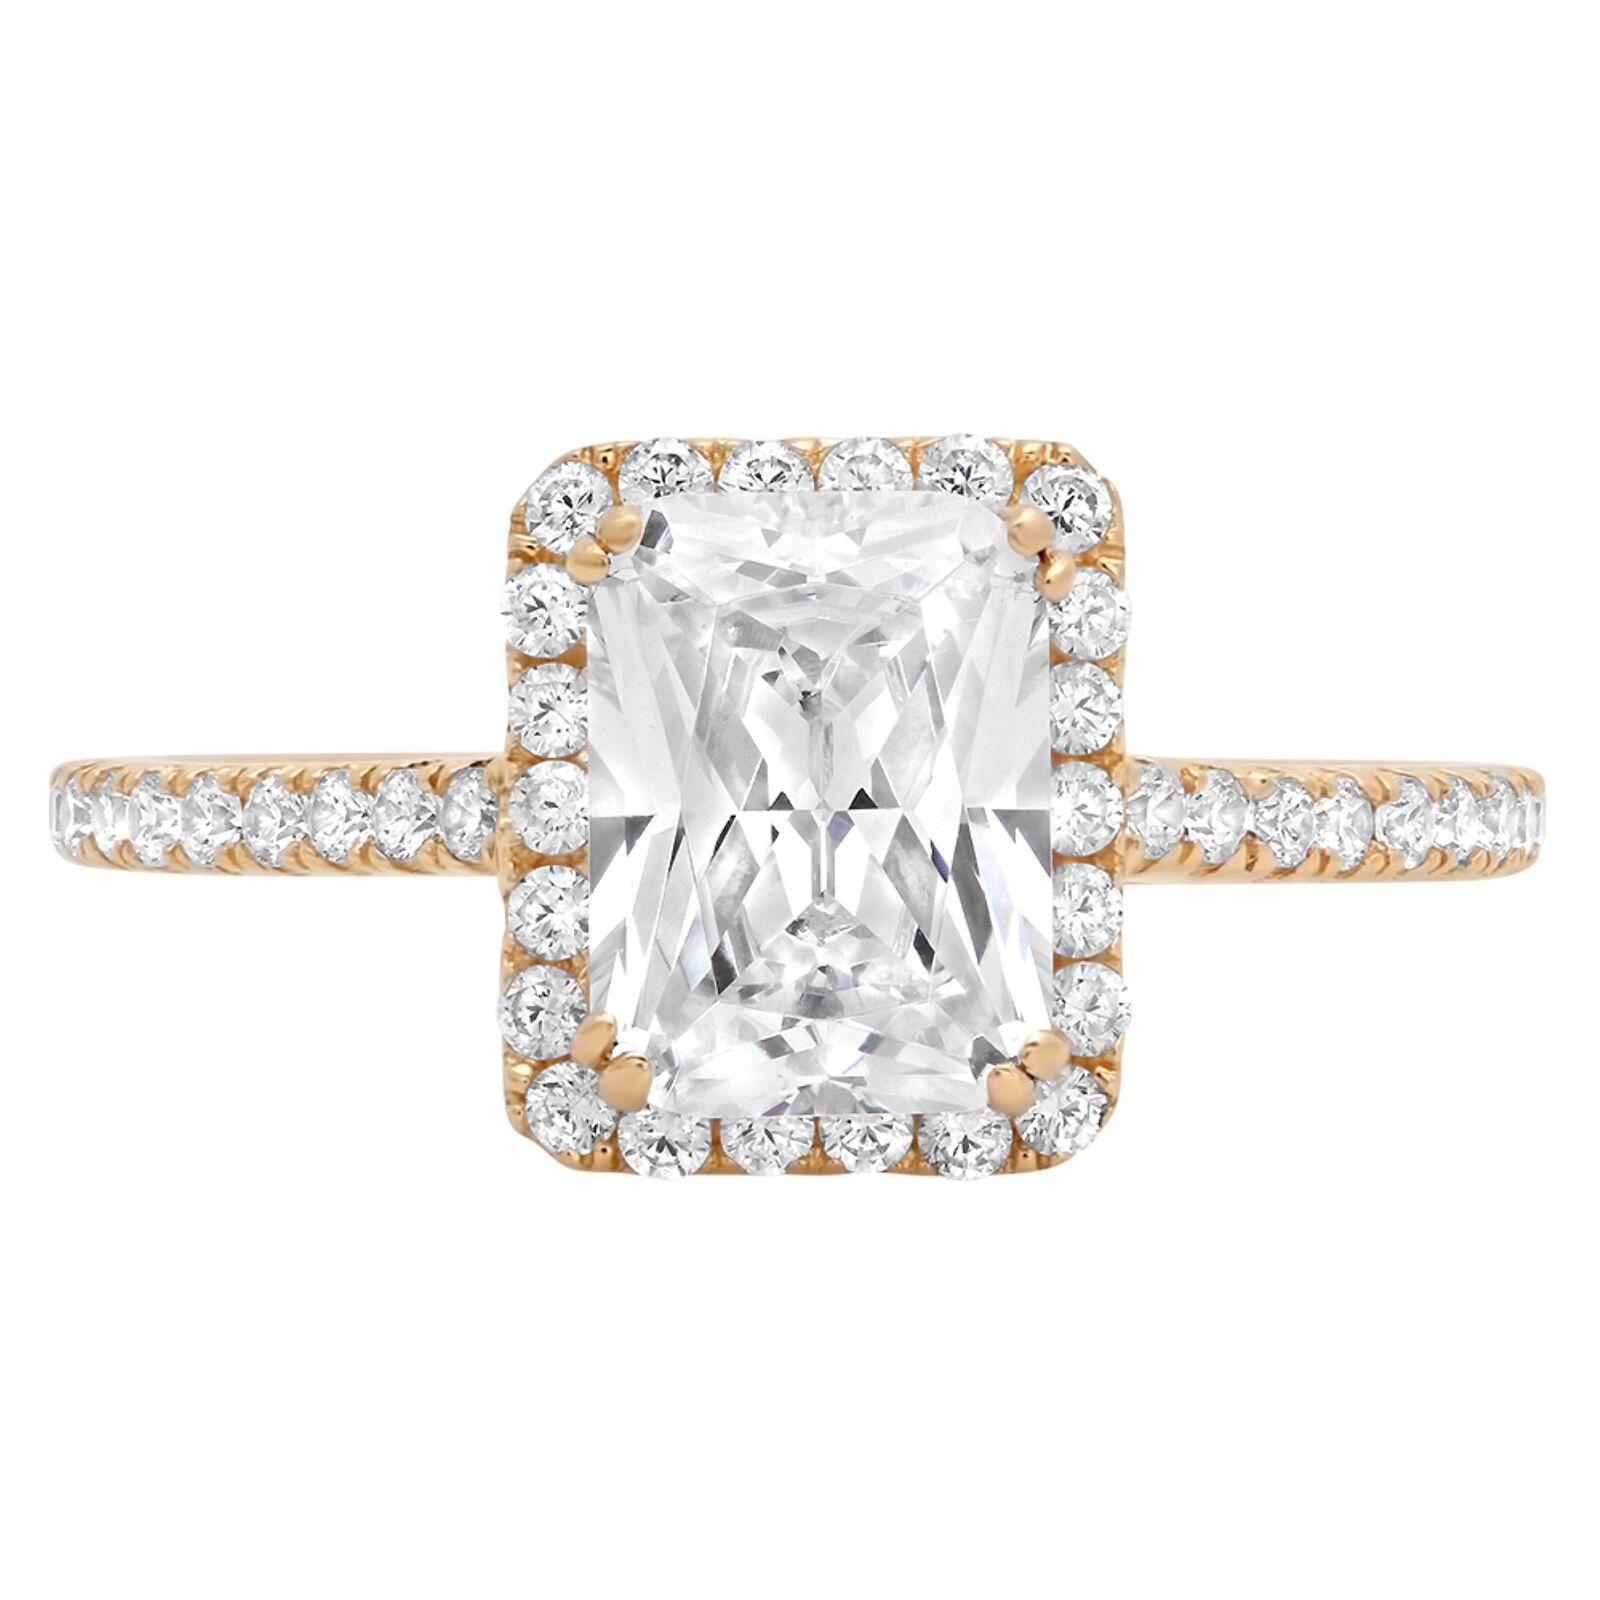 2.18ct Emerald Halo Wedding Promise Engagement Bridal Ring 14k Yellow gold